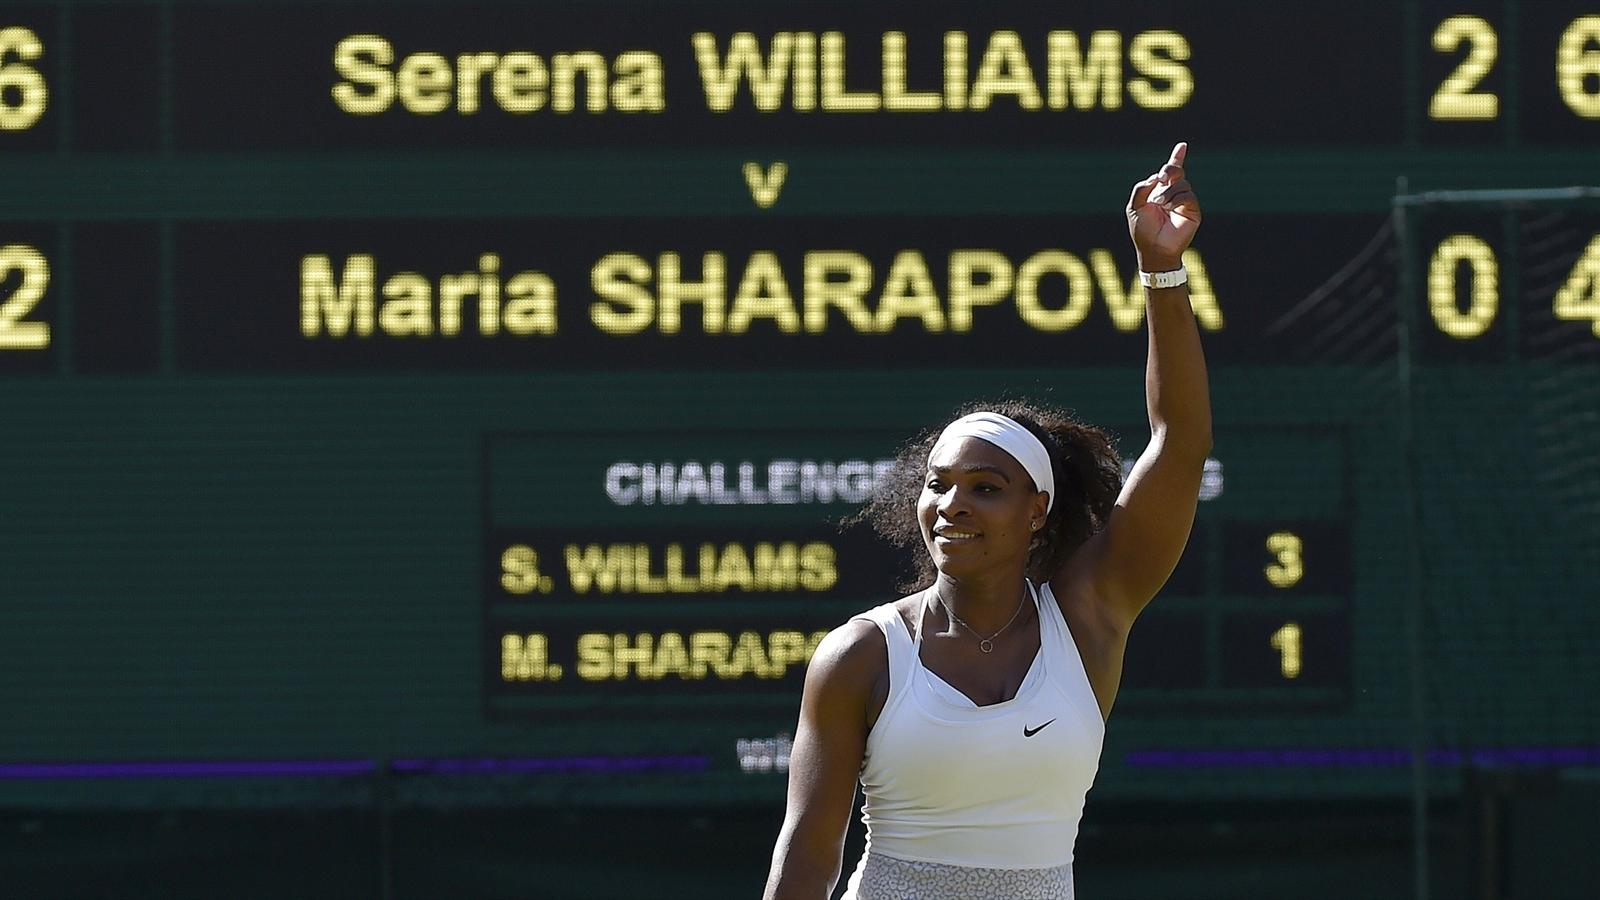 Serena Williams celebrates after winning her match against Maria Sharapova